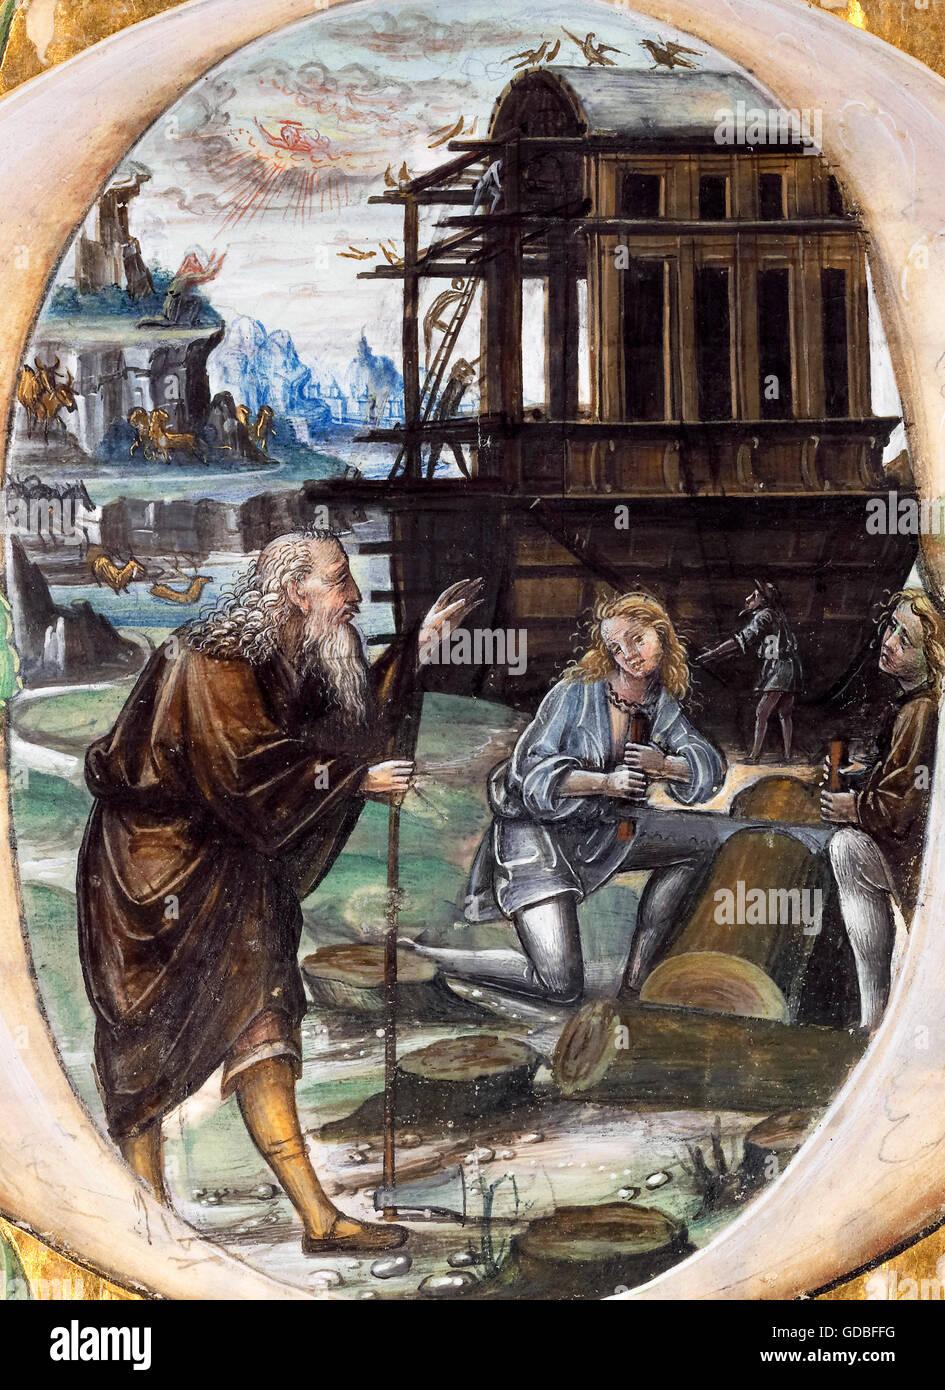 Noah's Ark. Noah Directing the Construction of the Ark, illumination by Master B F, c.1495-1510 - Stock Image